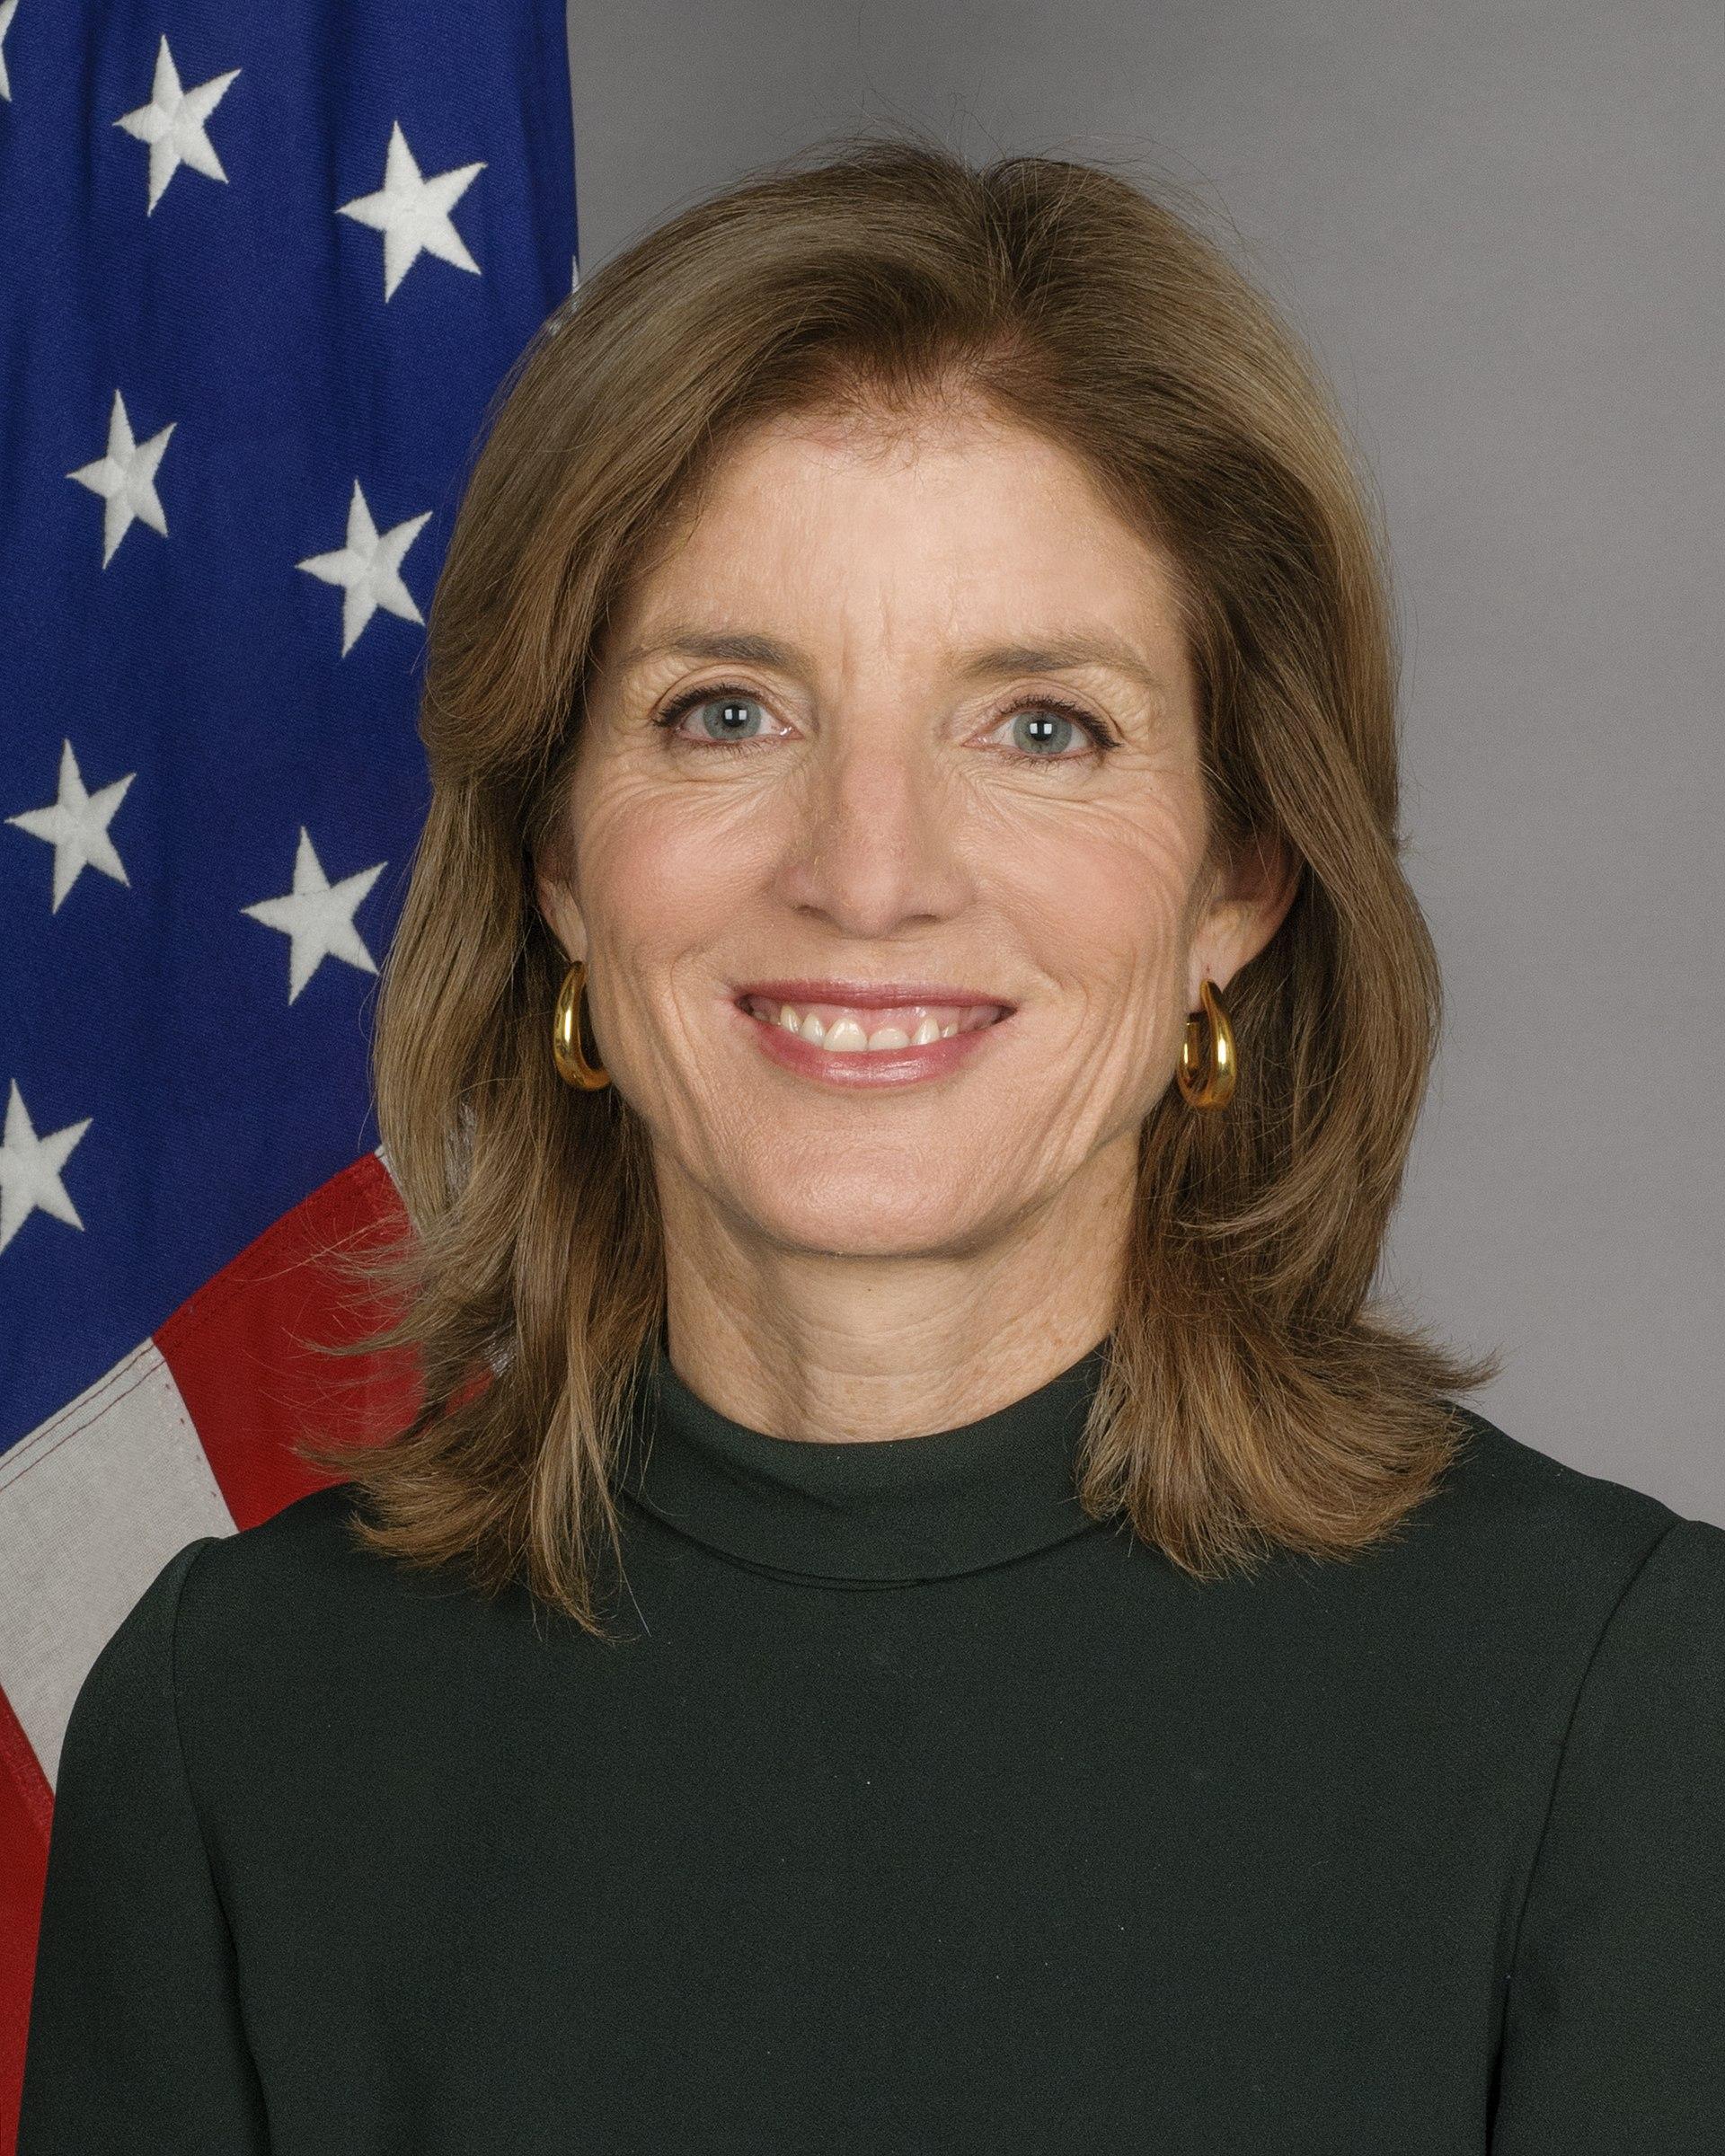 Caroline Kennedy US State Dept photo.jpg